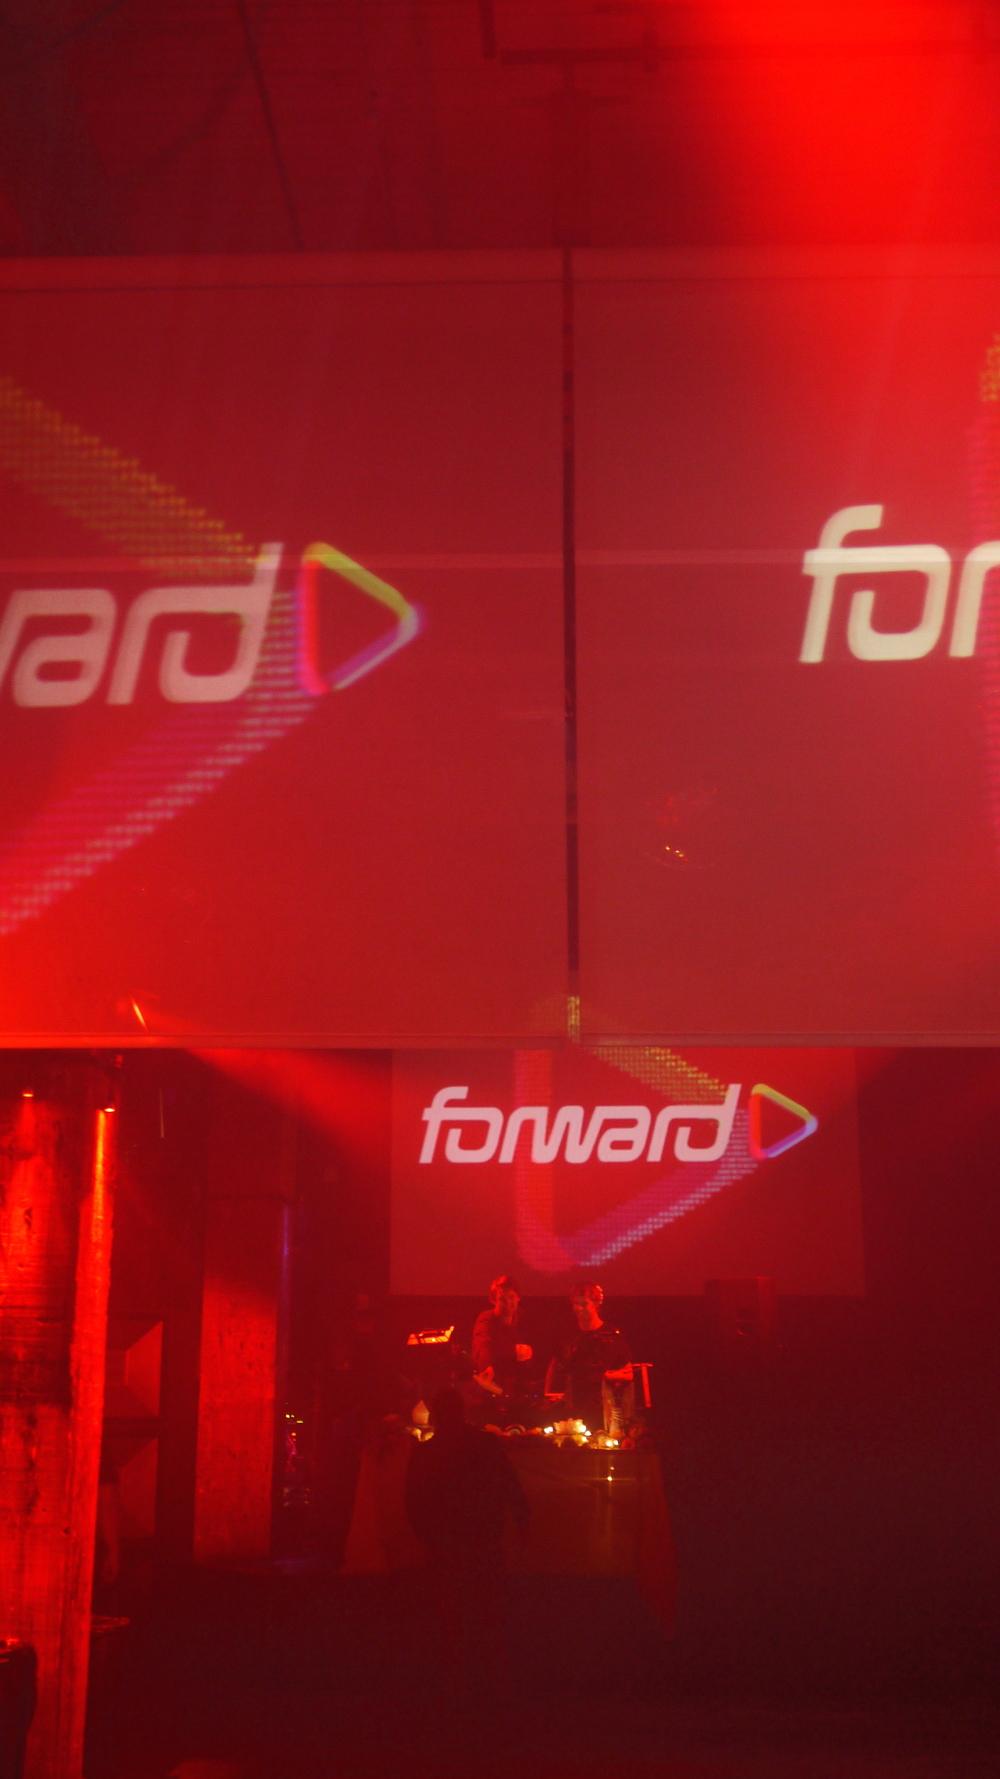 FWD: ll-year anniversary